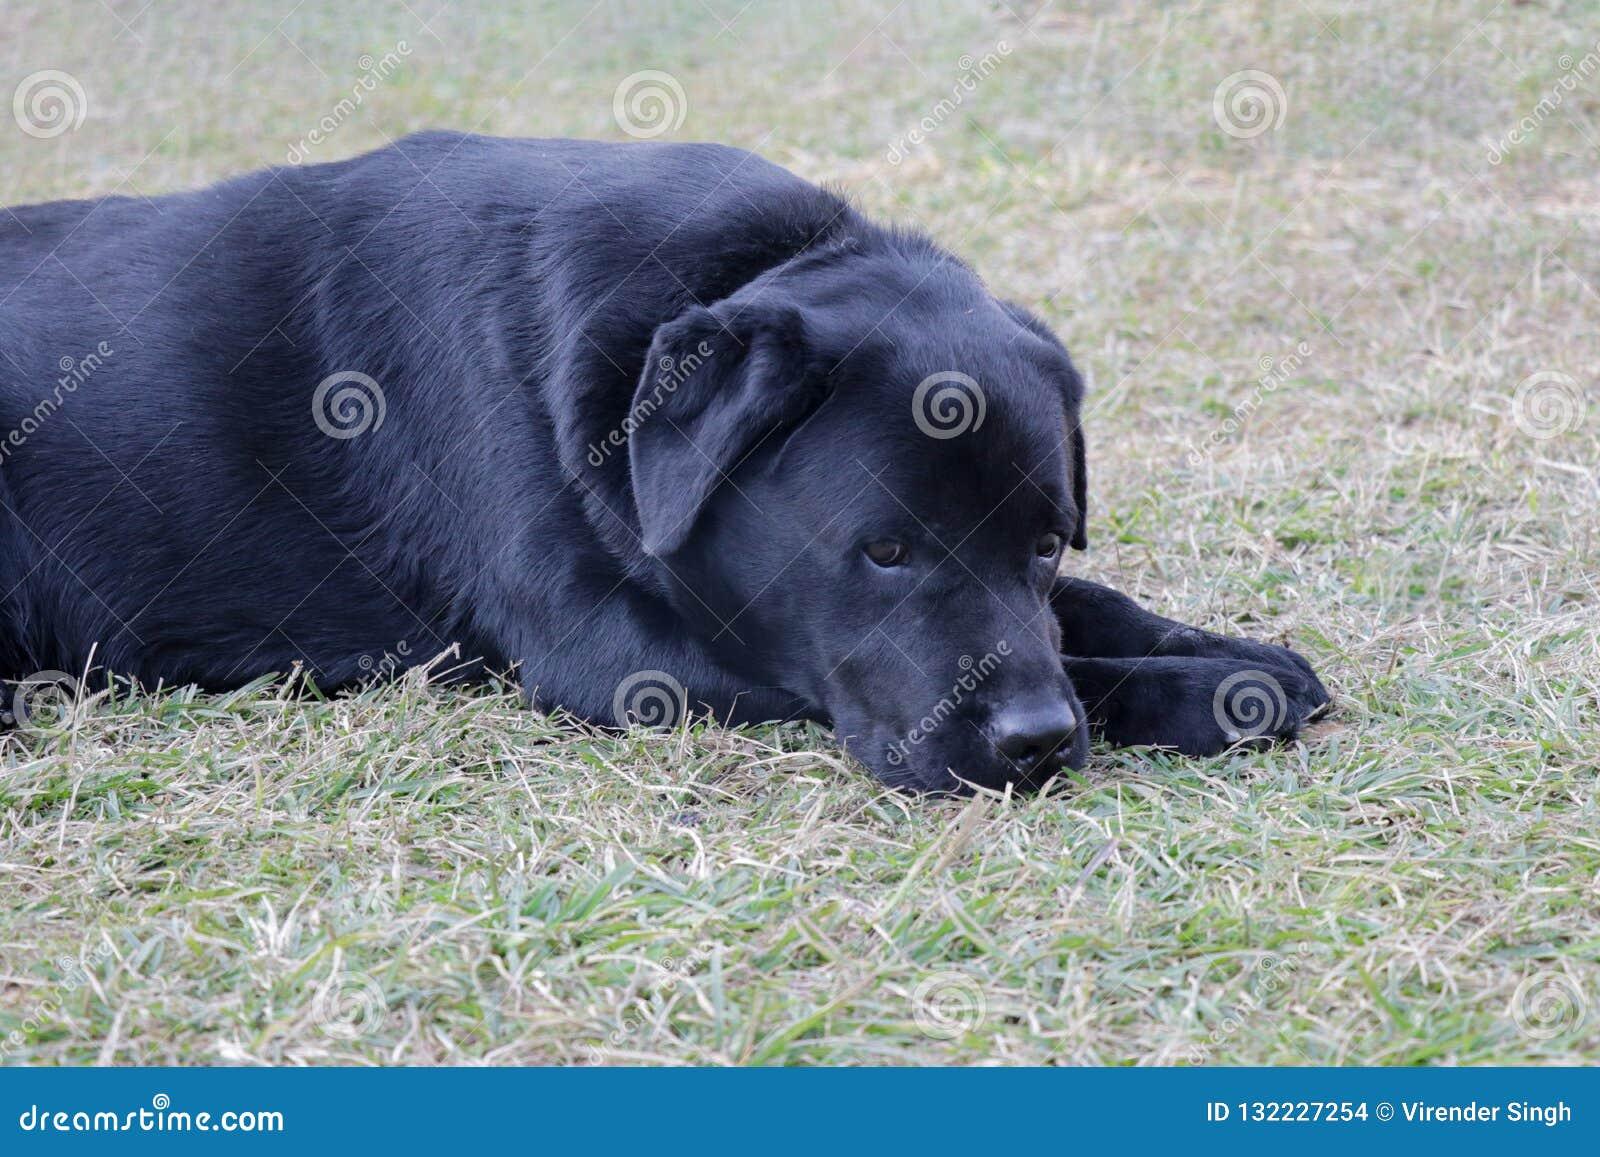 Sad labrador dog in lying in sadness mood